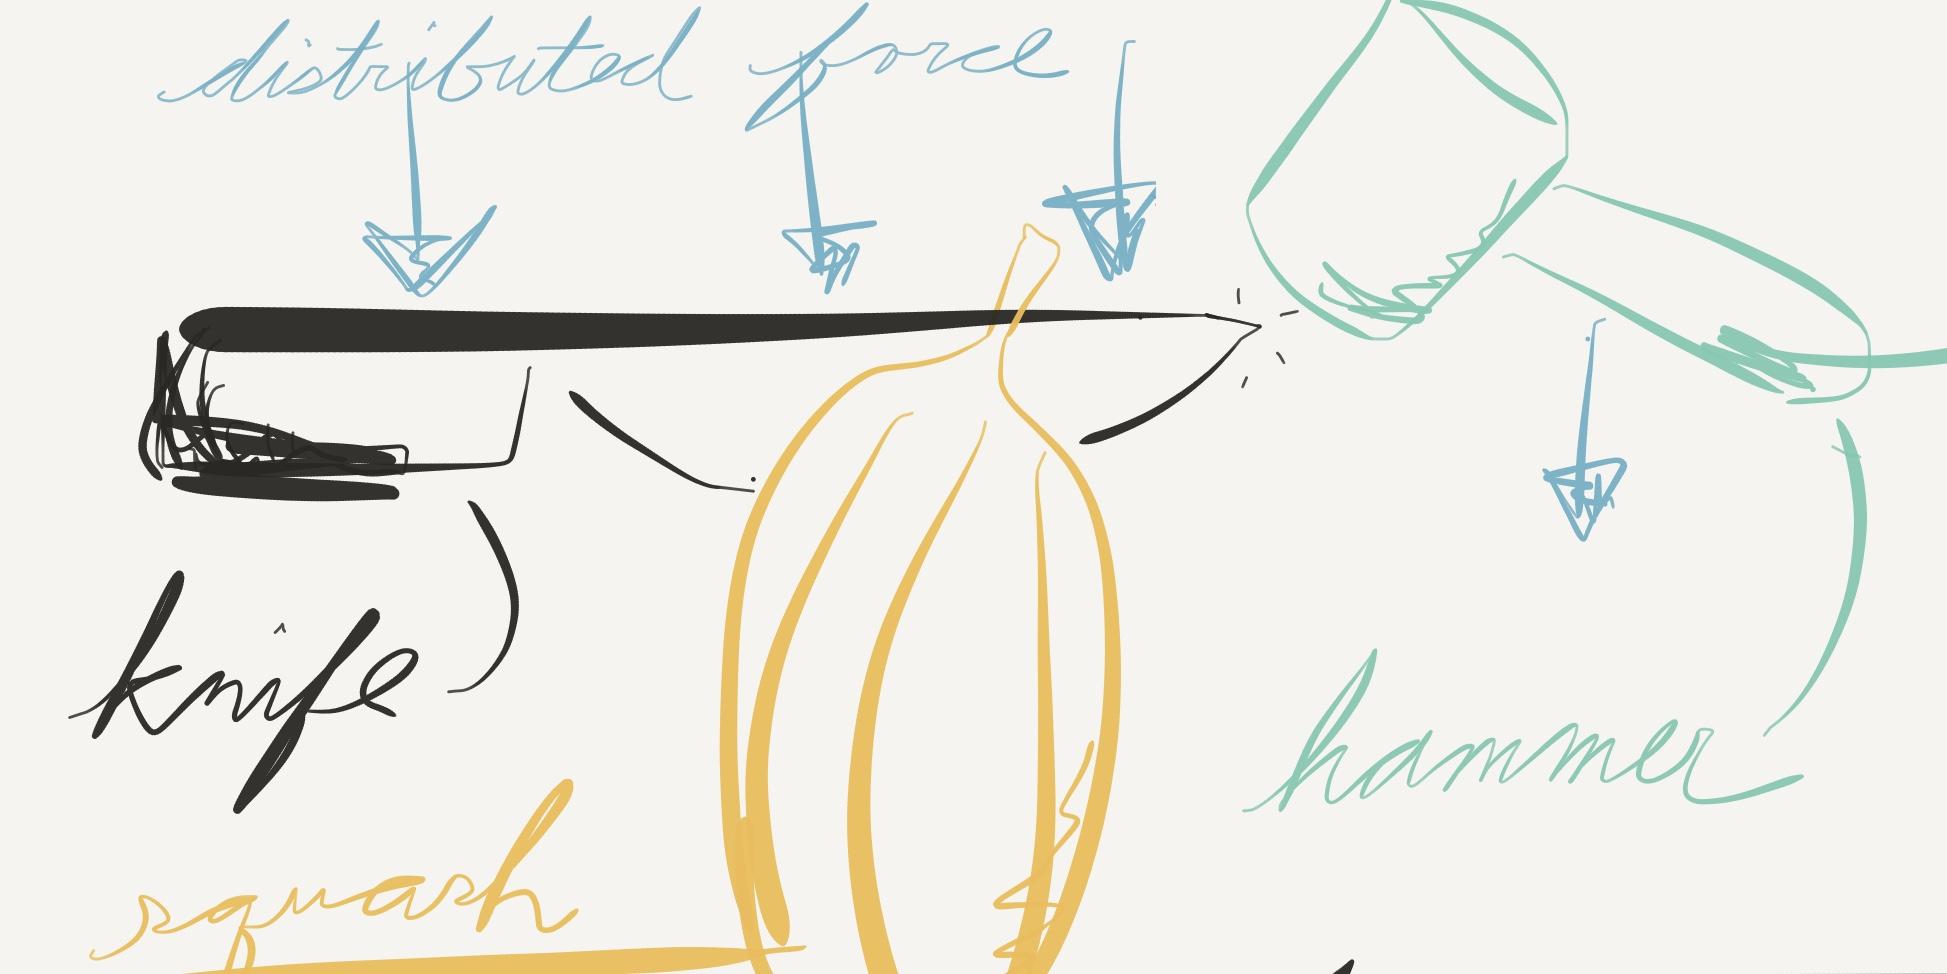 Doodled diagram of how to cut squash, Yiling Wong Nov 21, 2016